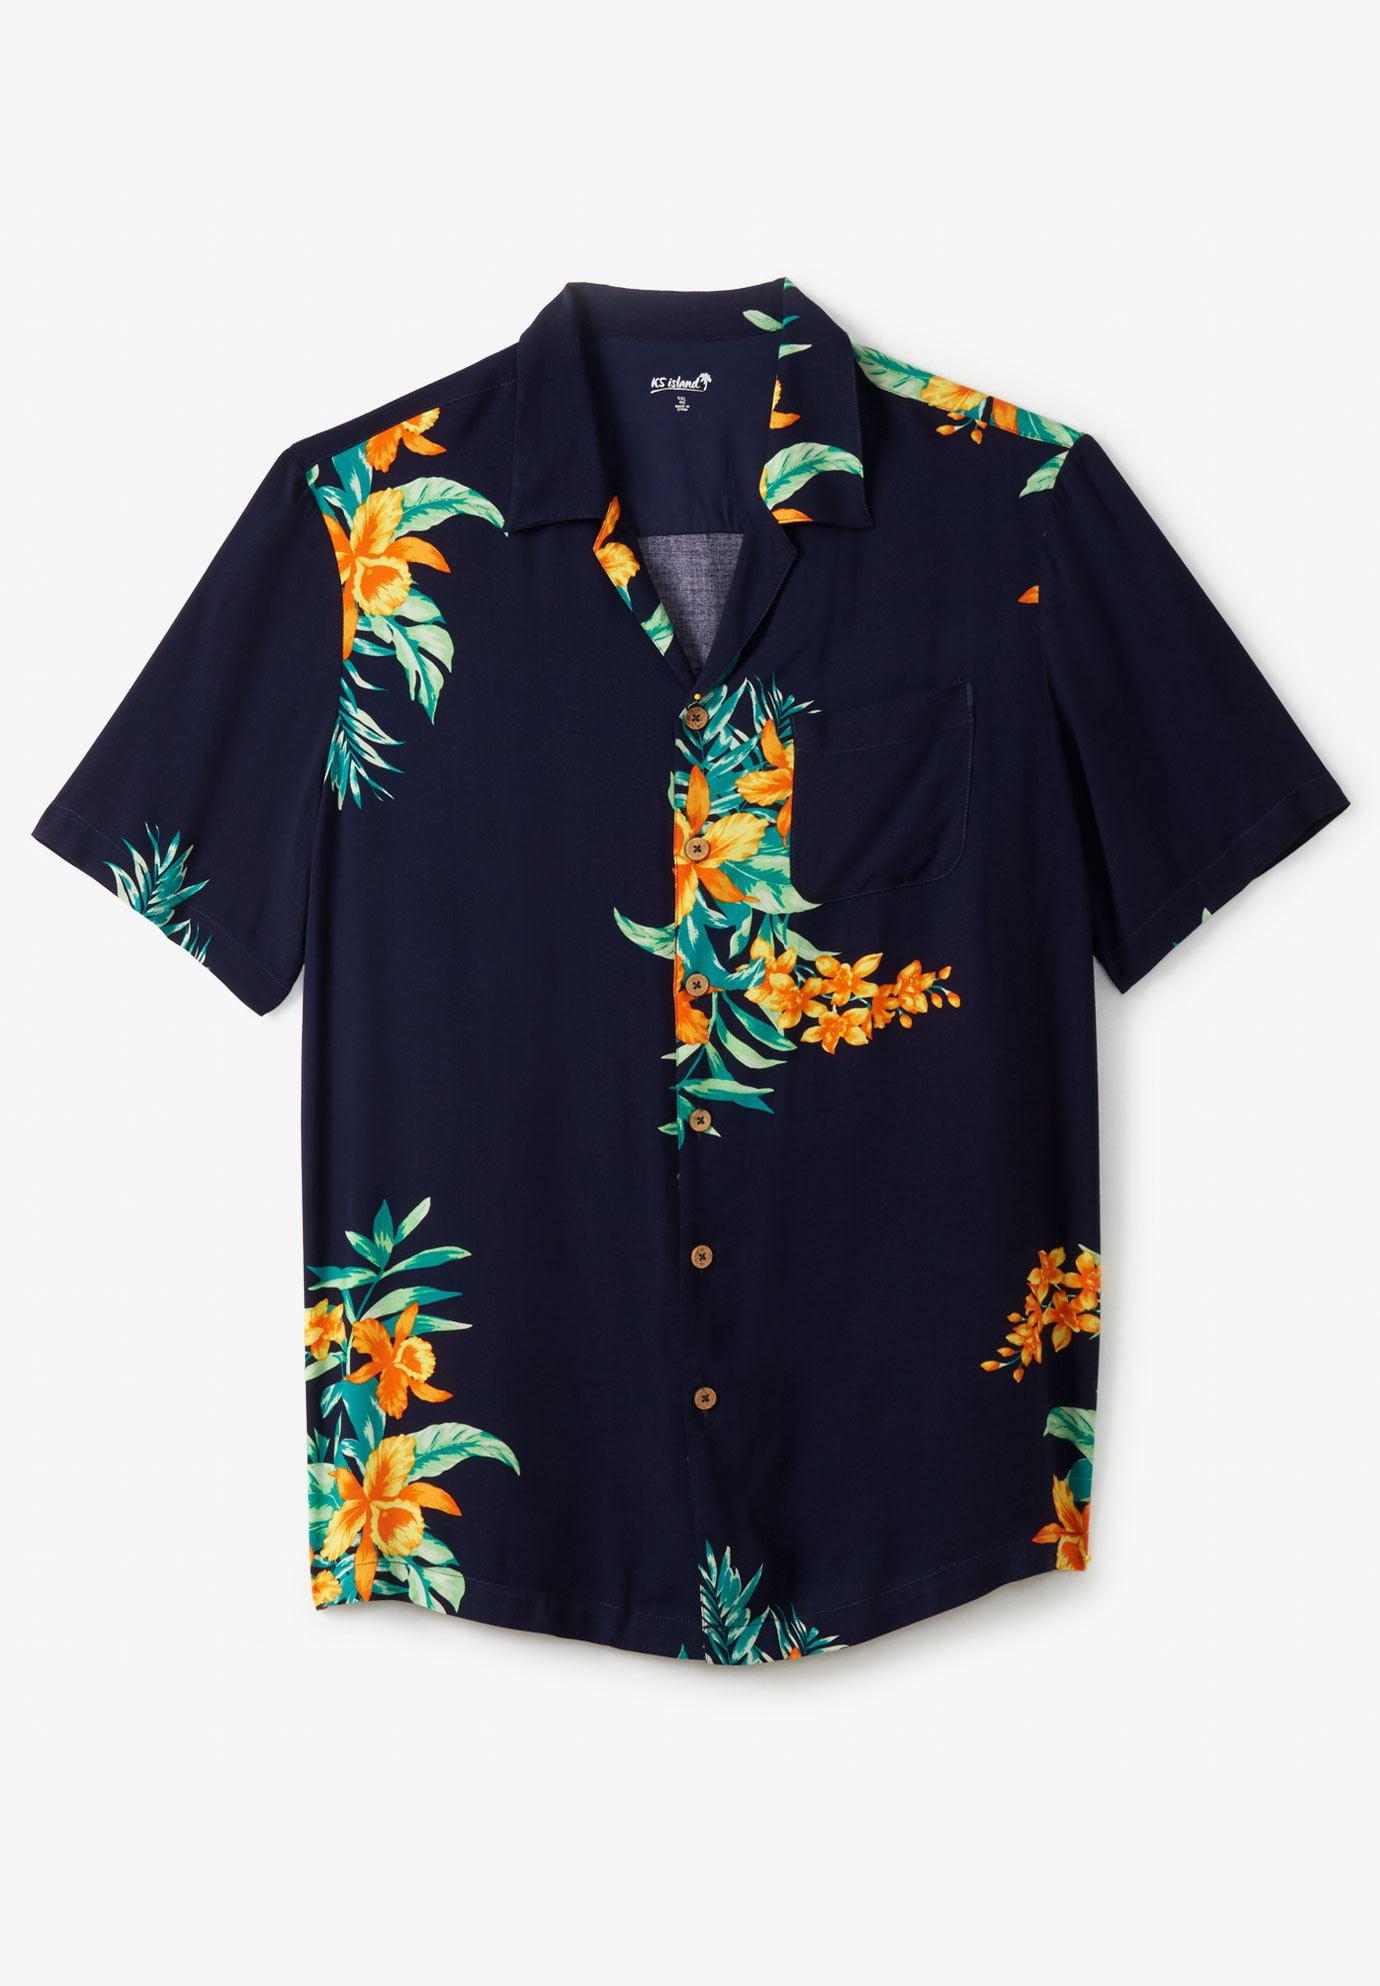 Ks Island Men's Big & Tall Tropical Caribbean Print Shirt